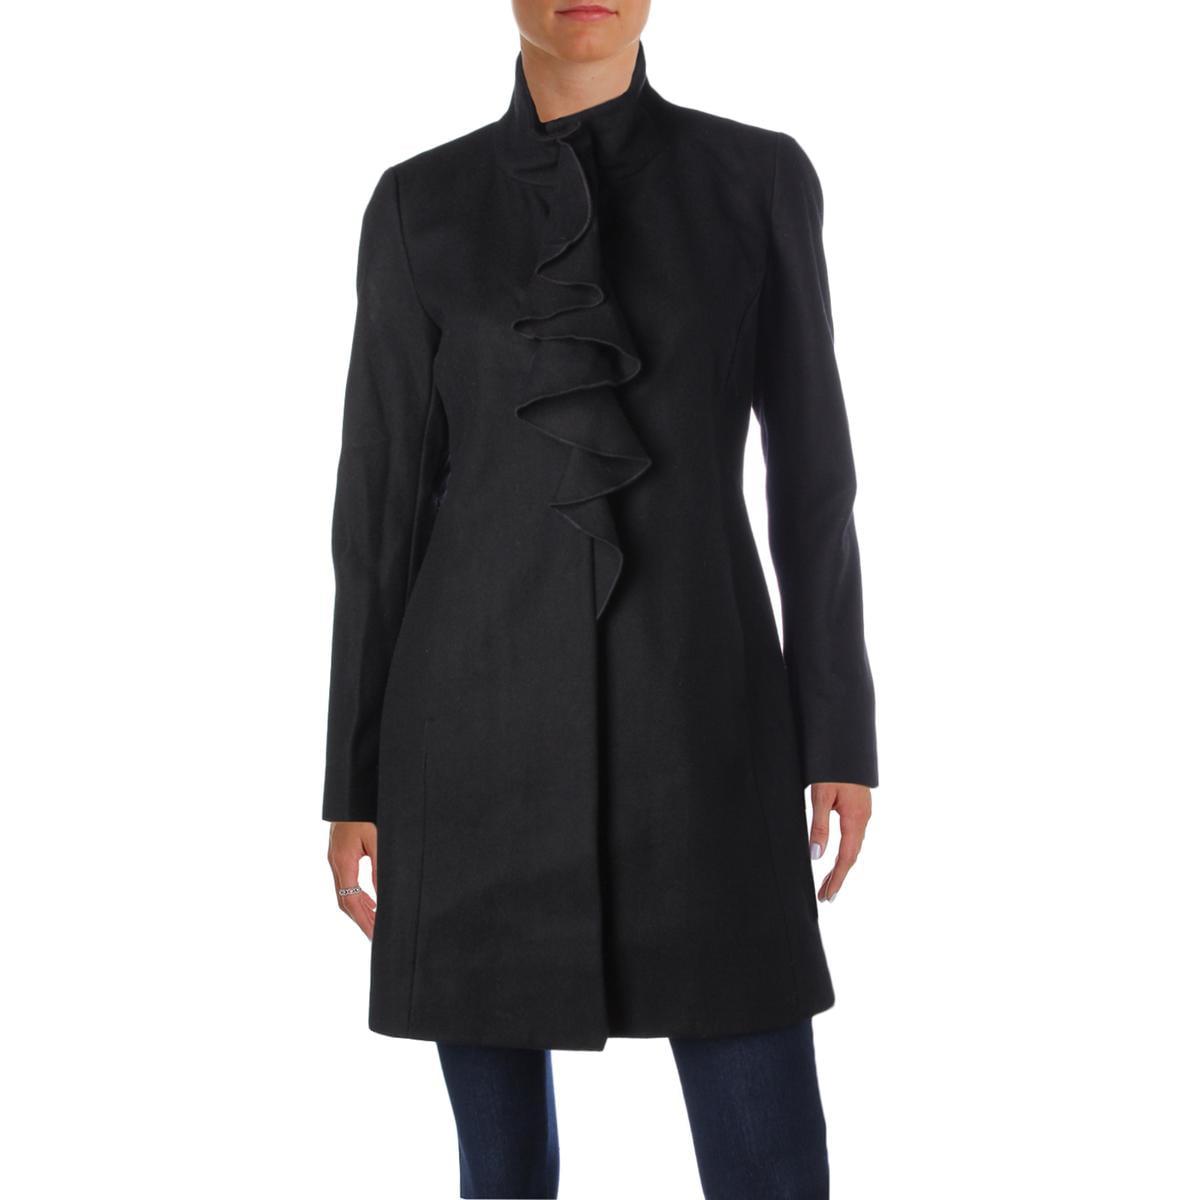 T Tahari Womens Kate Wool Ruffled Trench Coat by T Tahari